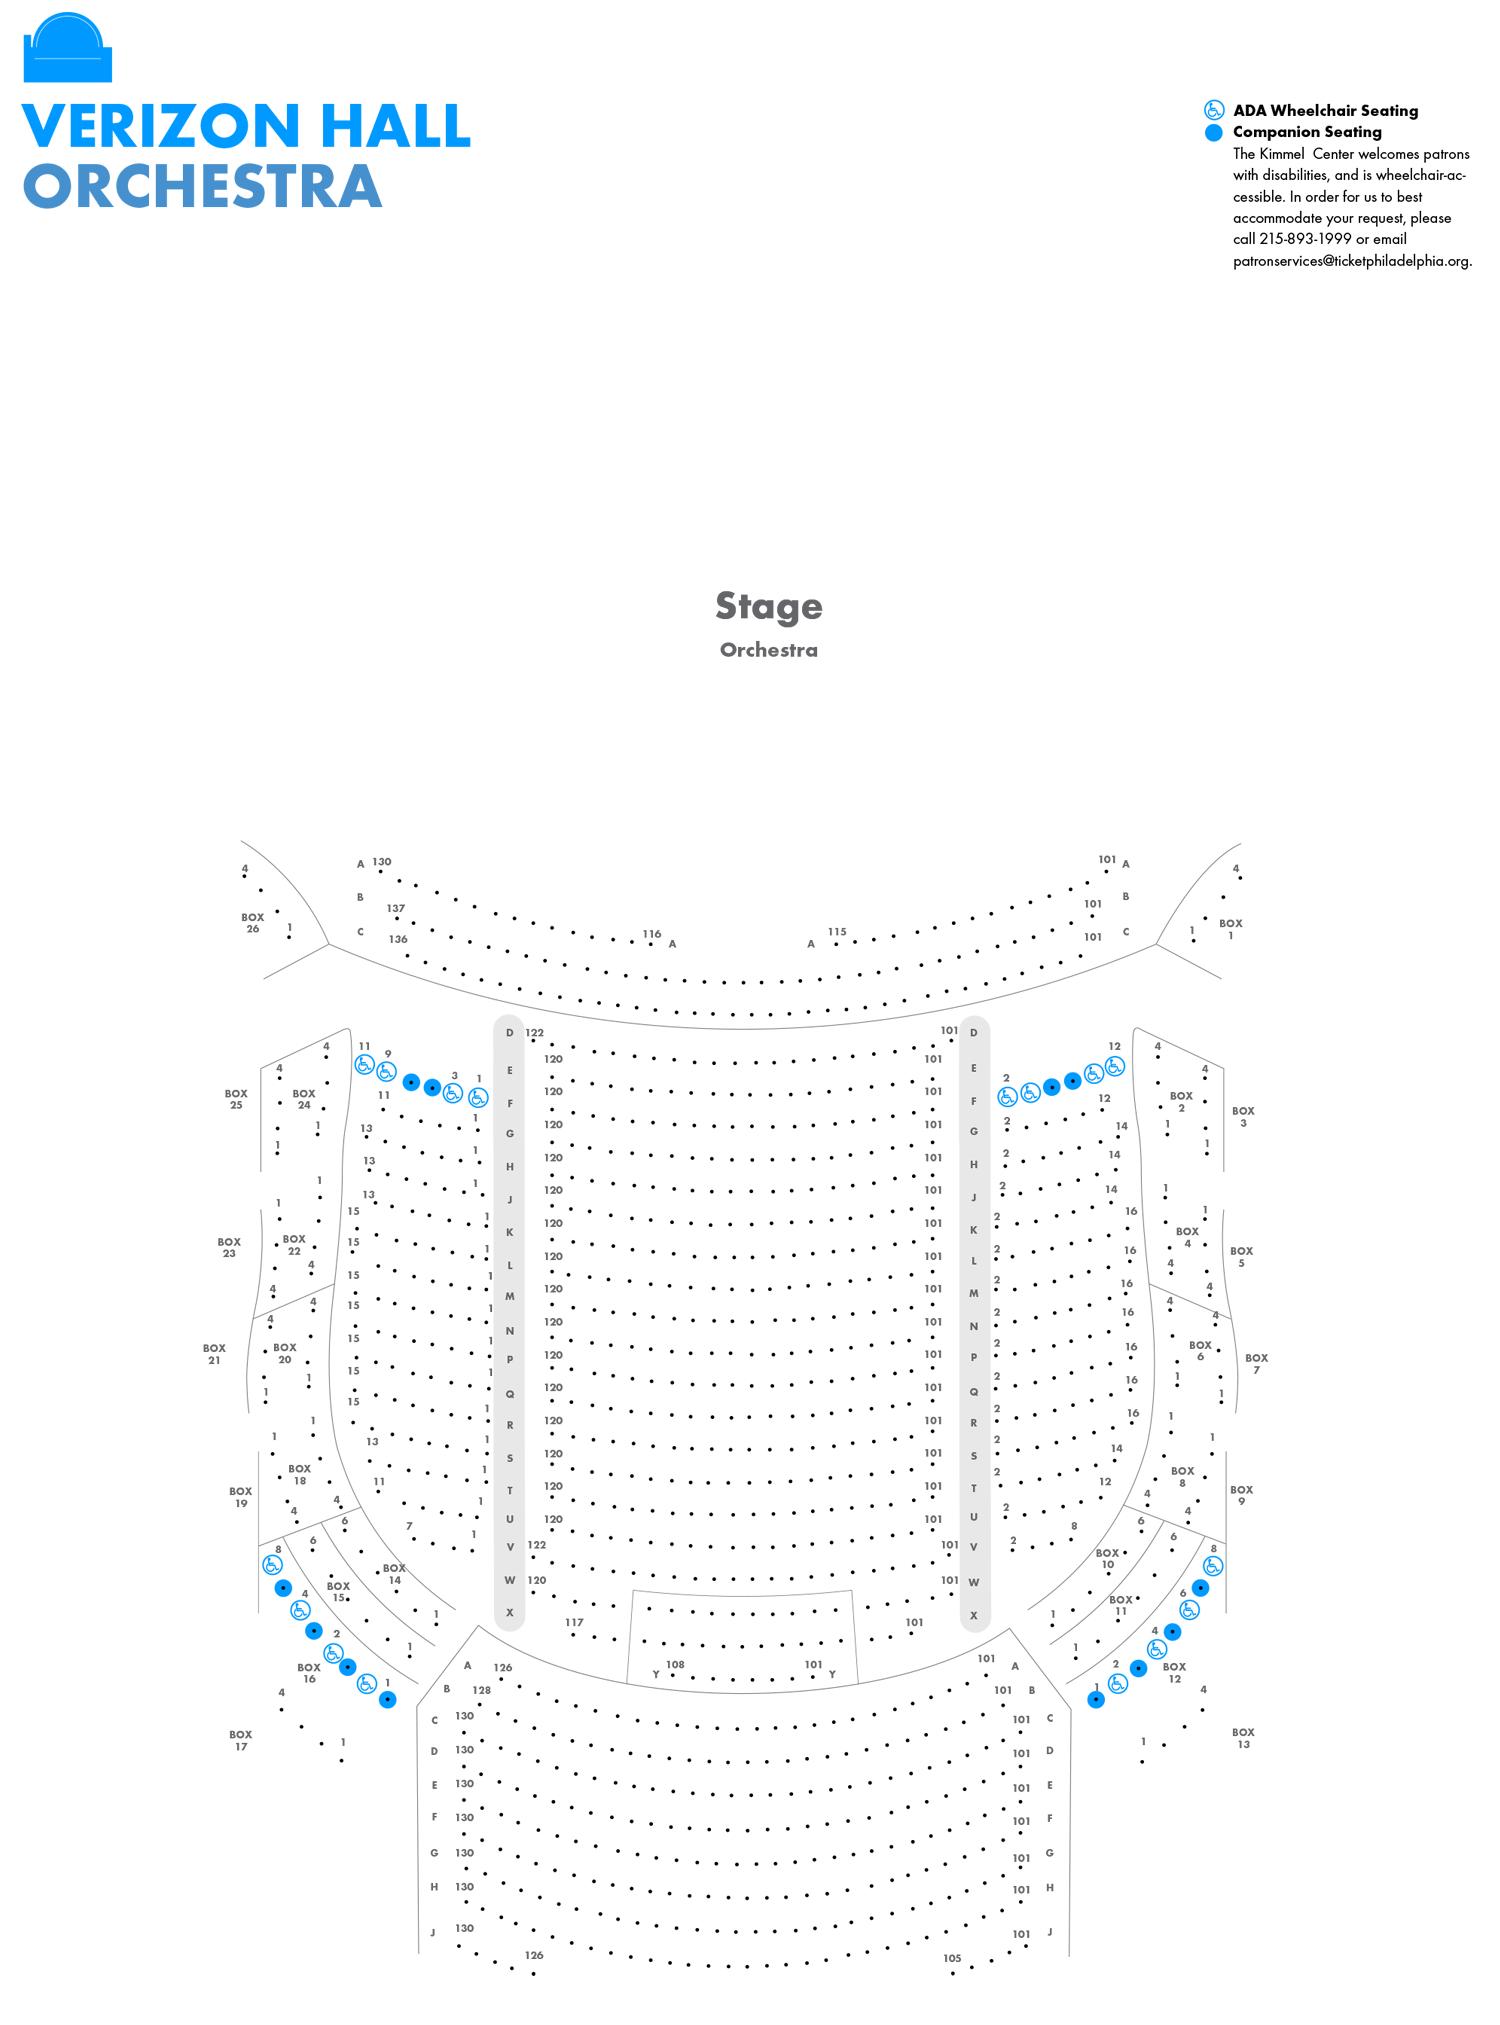 Verizon Hall Seating Charts  Kimmel Center pertaining to Verizon Center Seating Chart